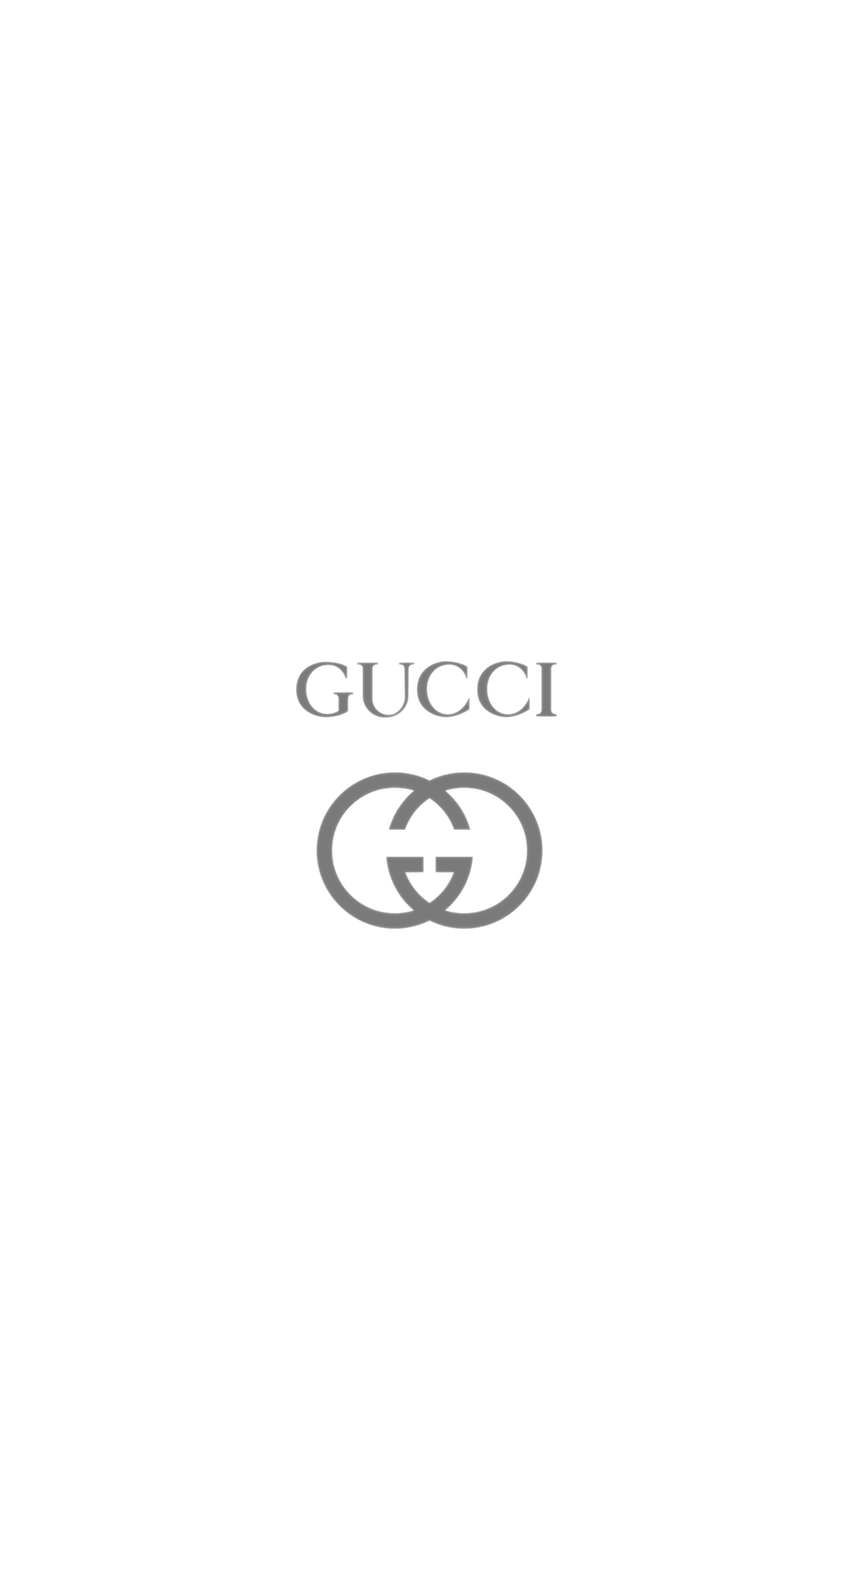 Gucci8 Phone Wallpaper Kenzo Wallpaper Hypebeast Wallpaper